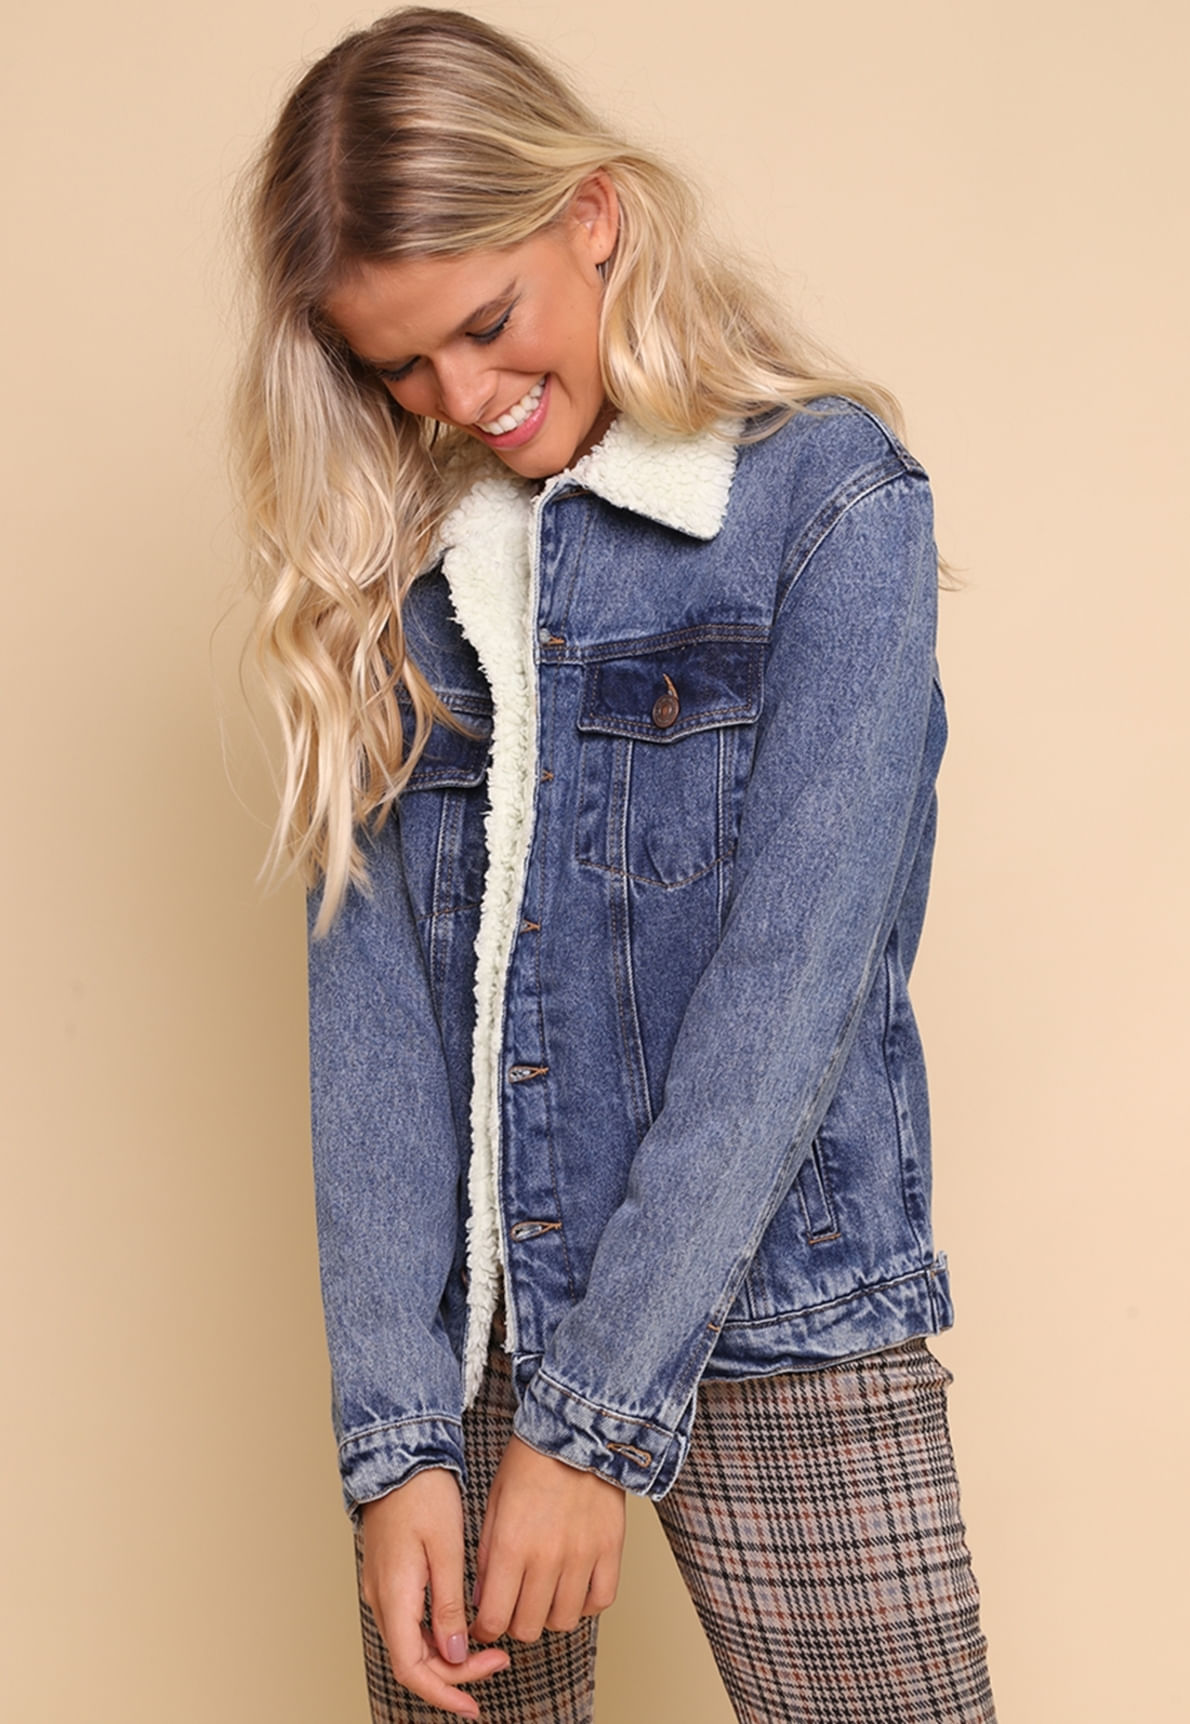 27276-jaqueta-jeans-pelinho-babygirl-mundo-lolita-01